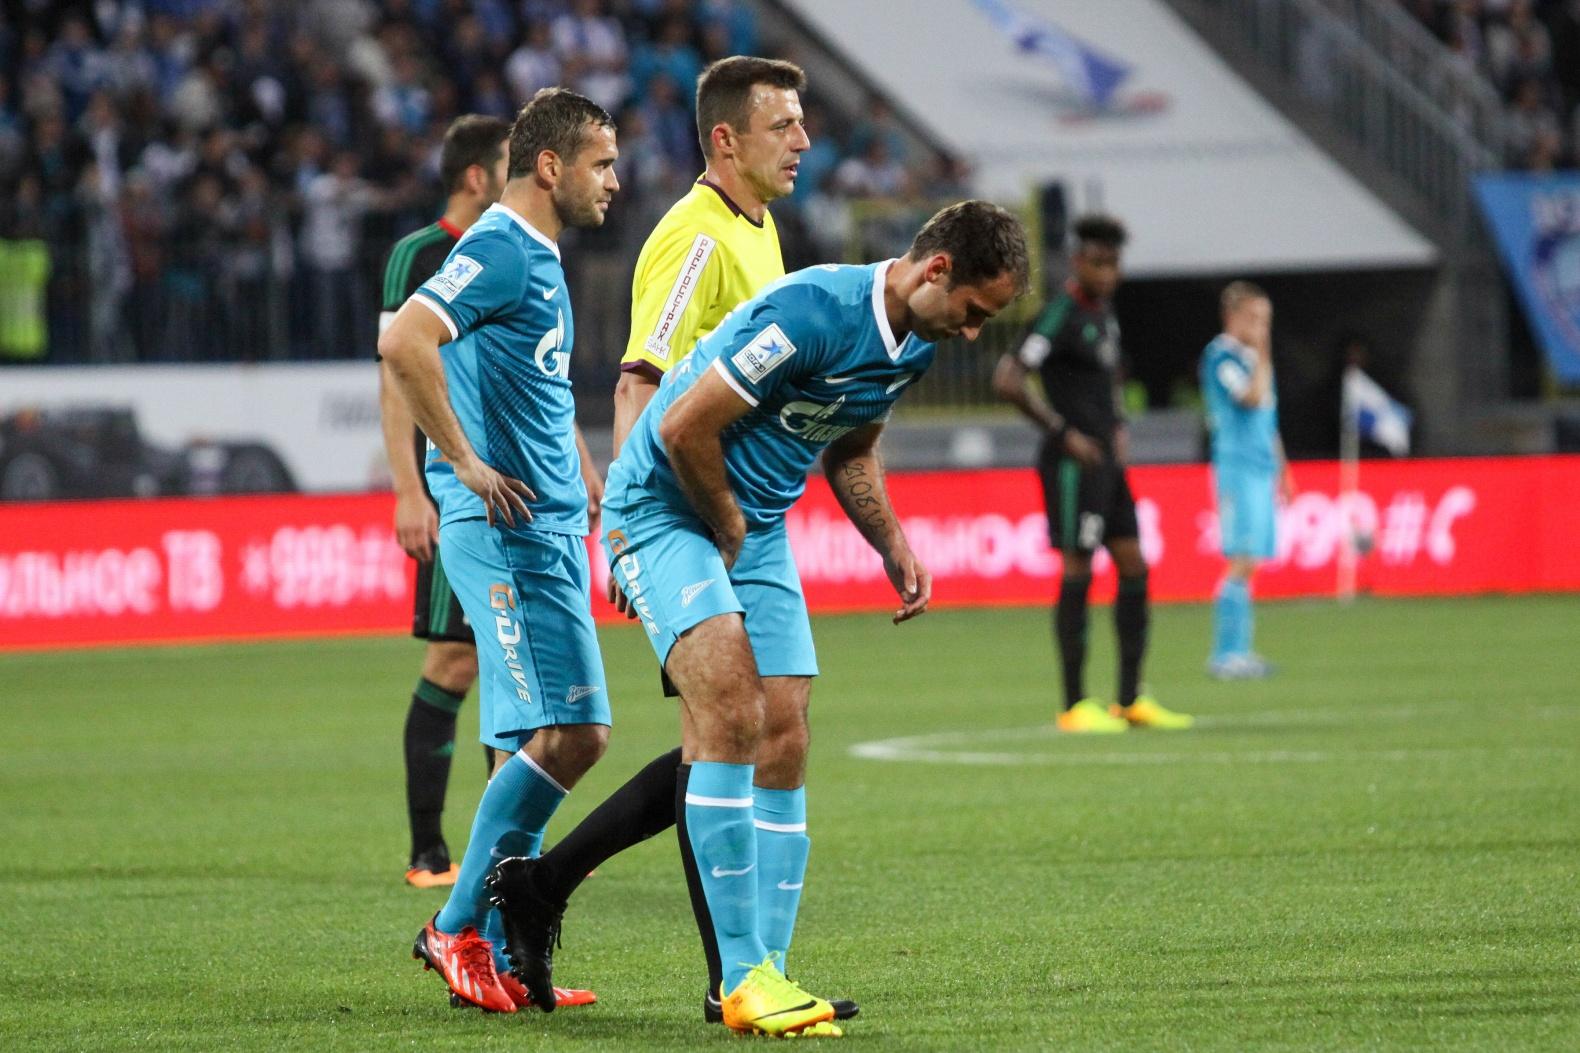 Топ-10 ярких моментов матча «Зенит» — «Терек»